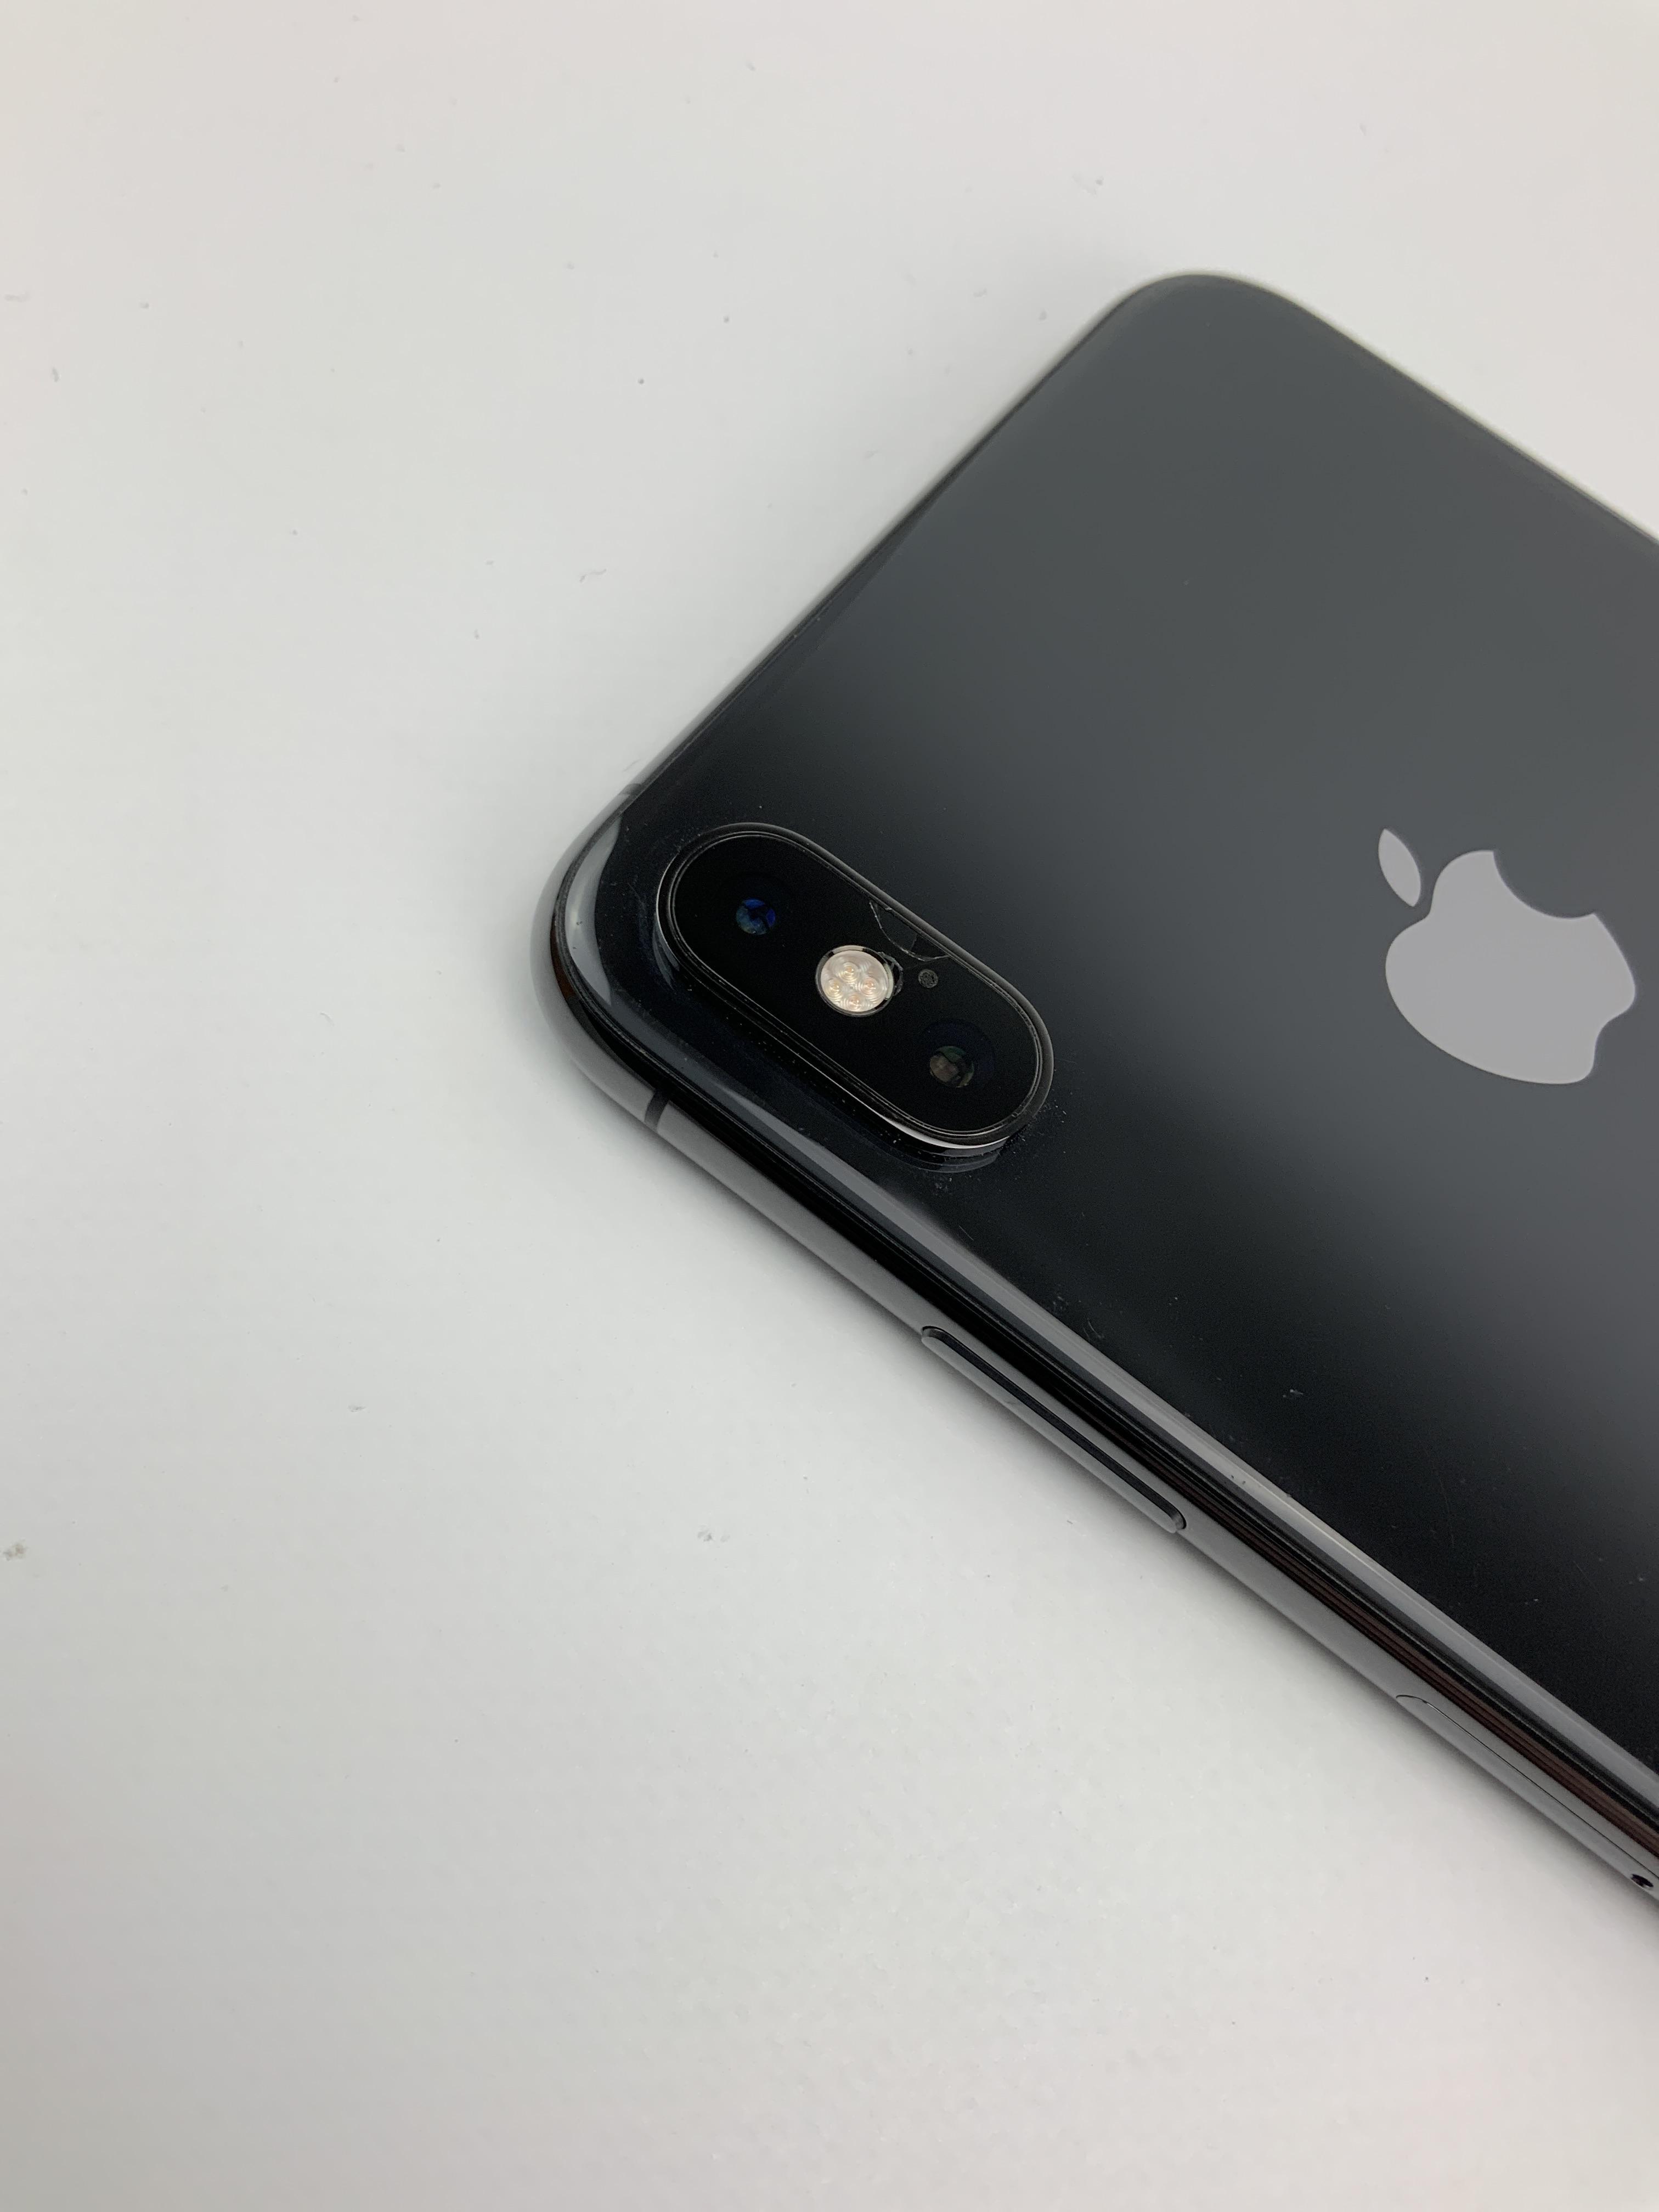 iPhone XS Max 256GB, 256GB, Space Gray, immagine 3